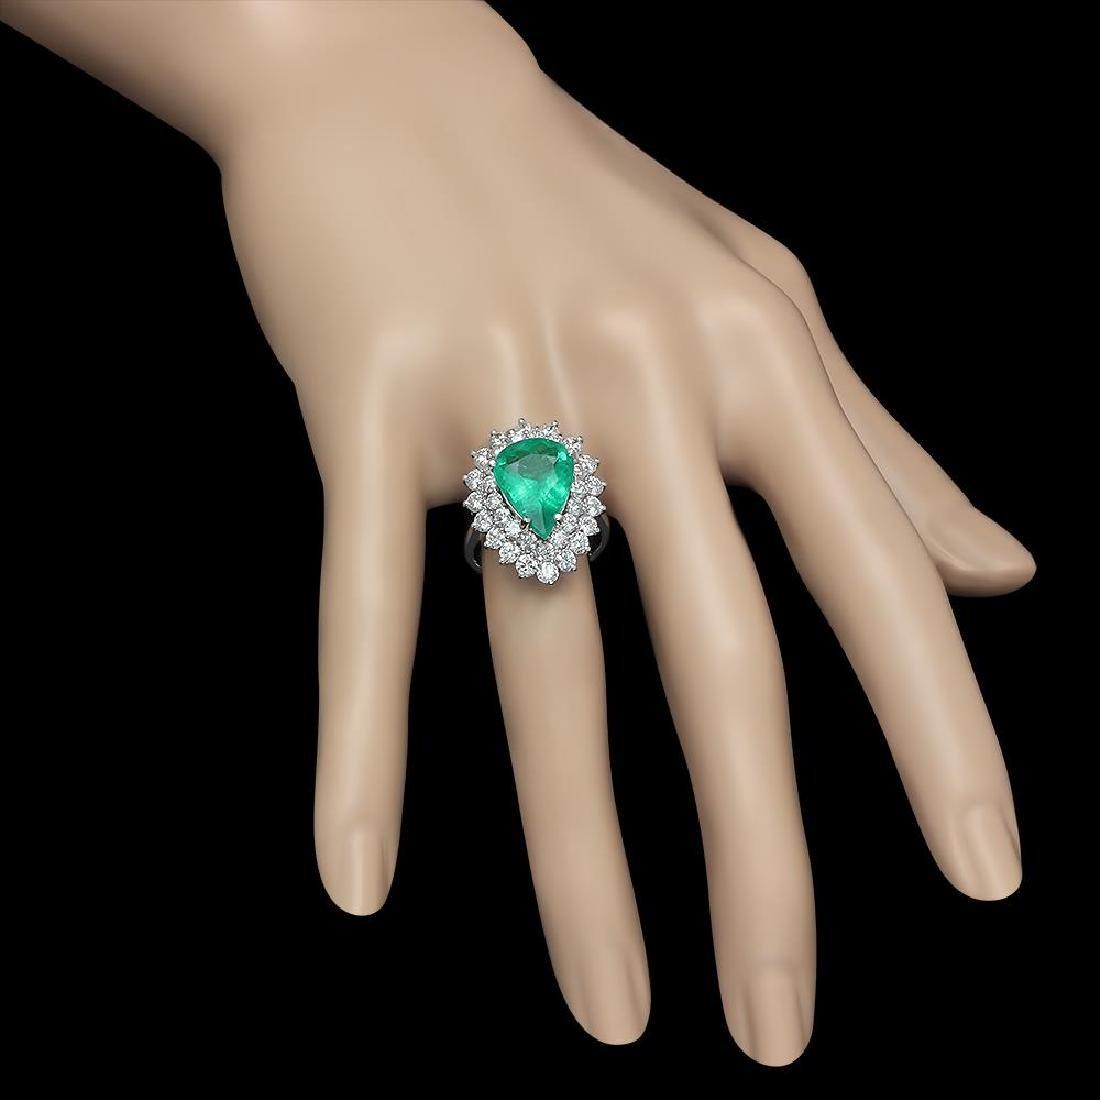 14K Gold 4.89 Emerald 2.65 Diamond Ring - 3